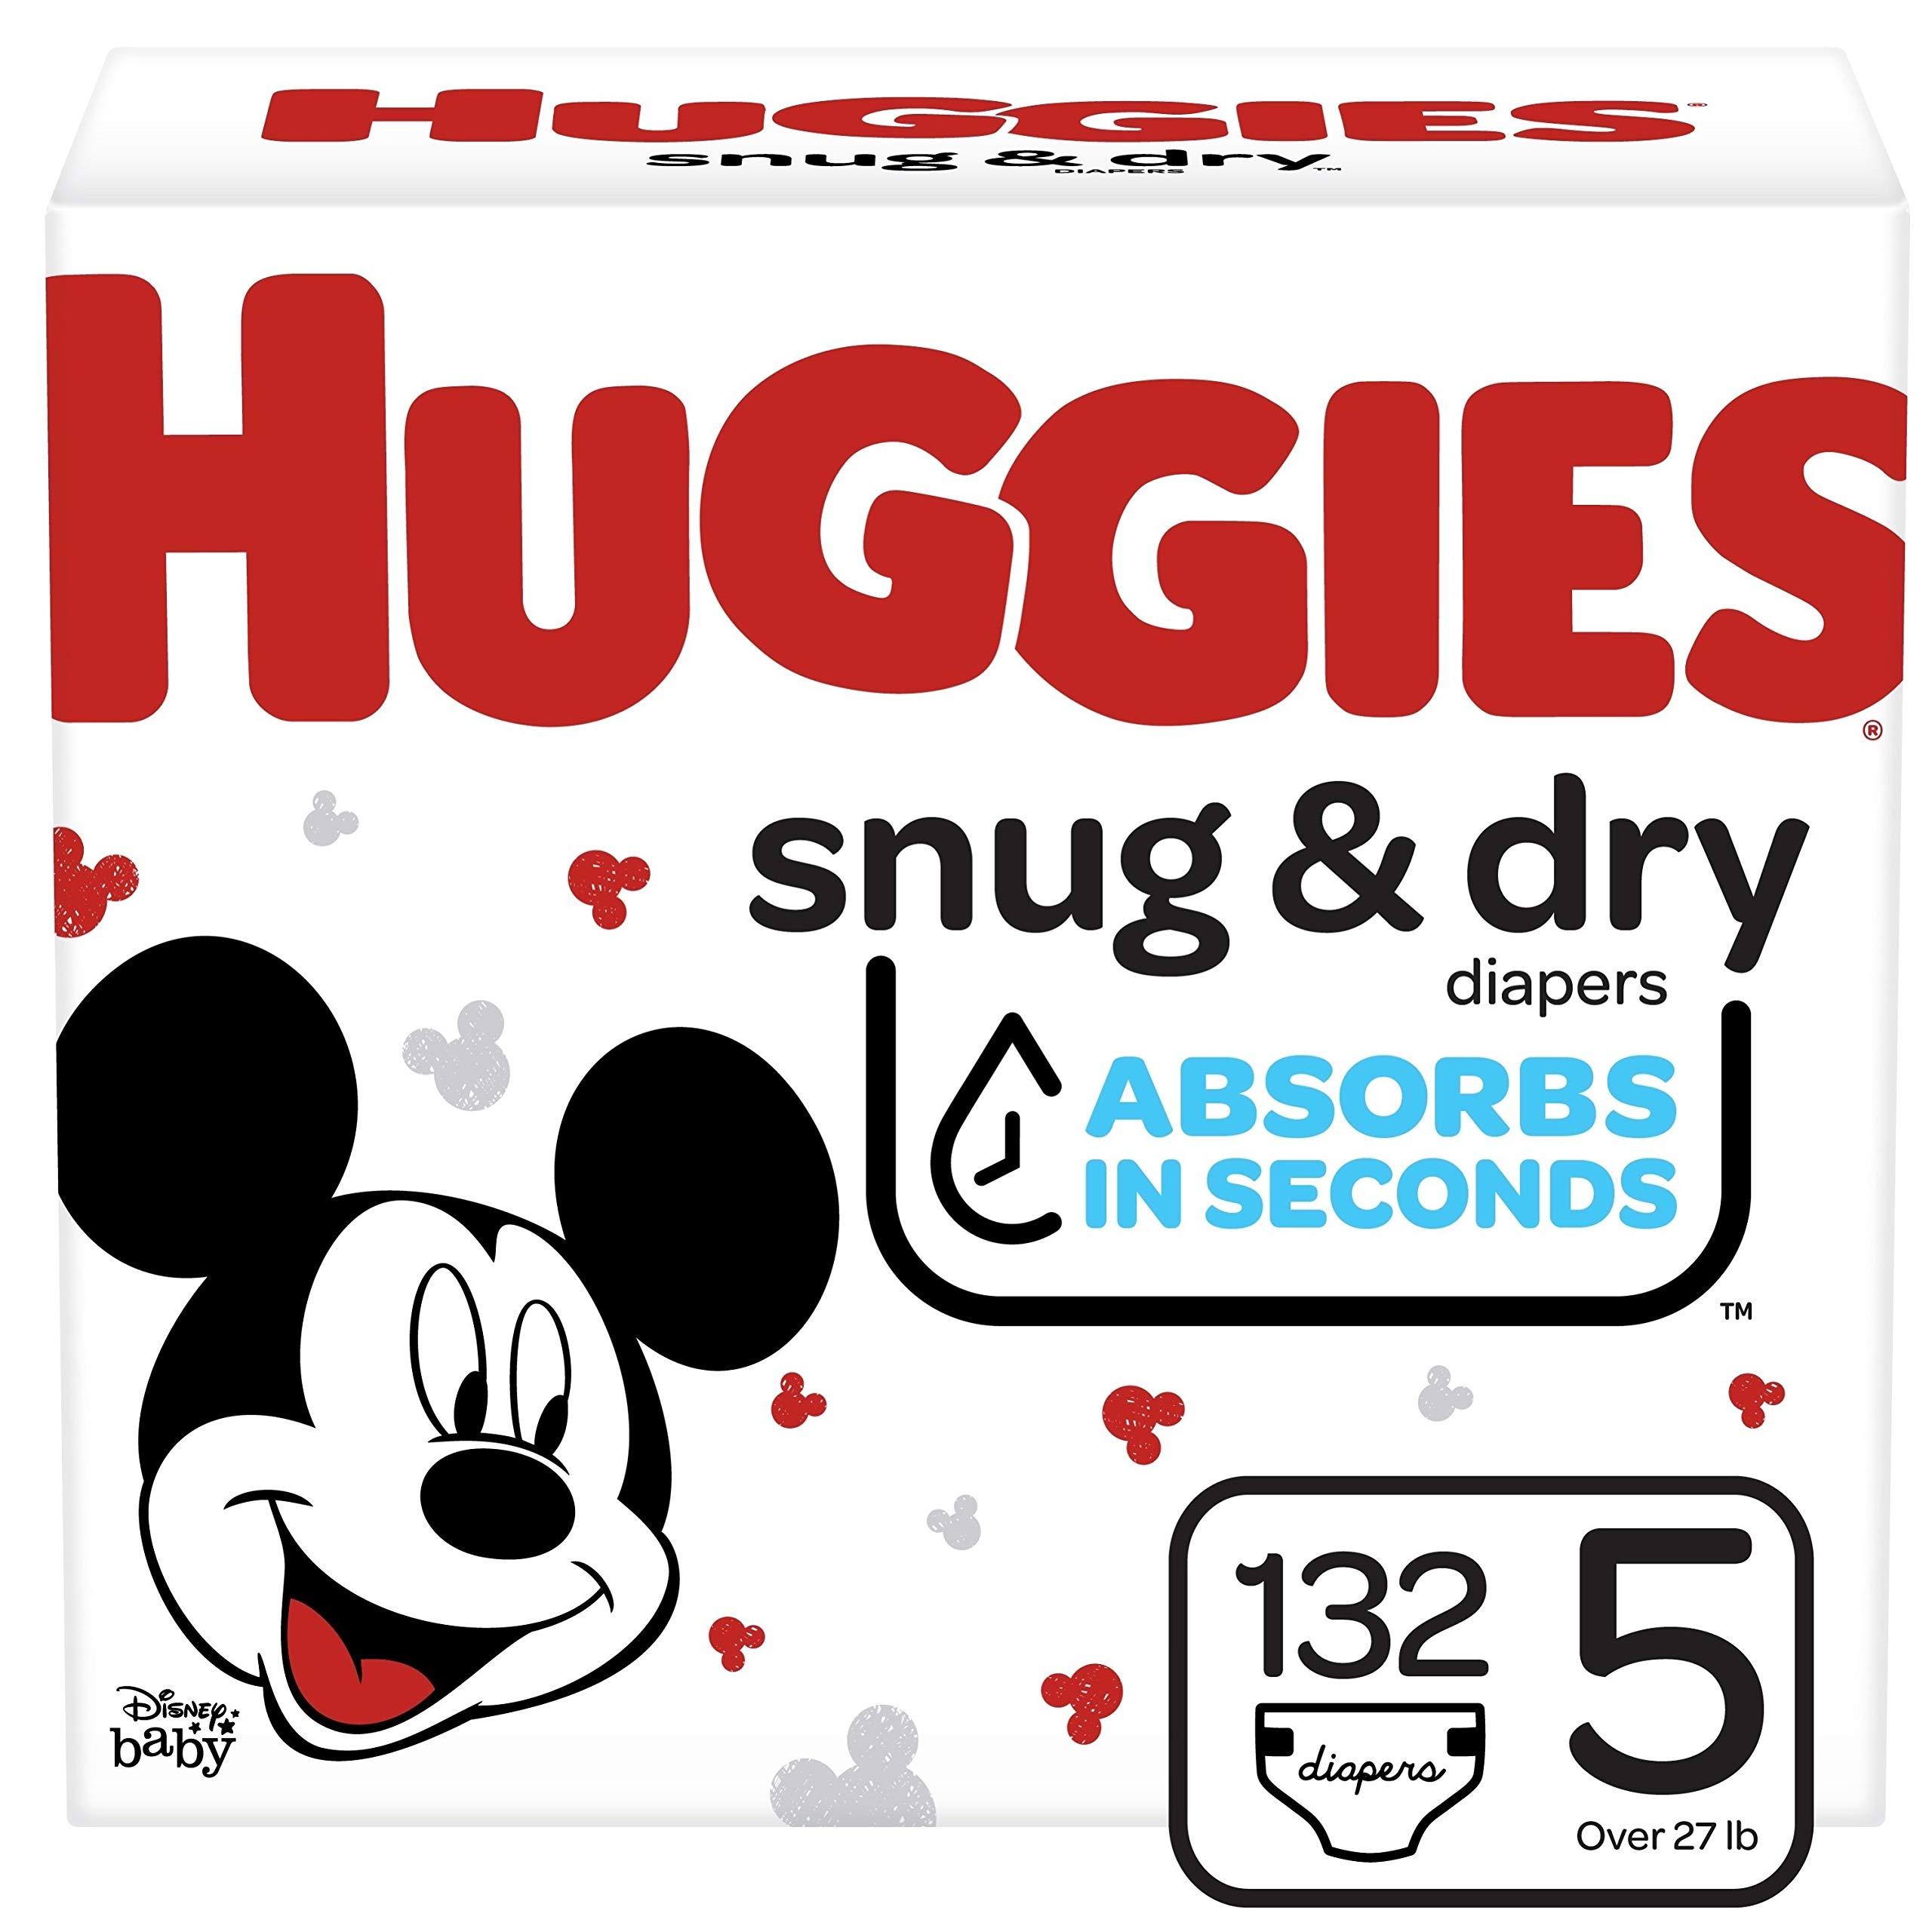 Huggies Snug & Dry Baby Diapers, Size 5, 132 Ct